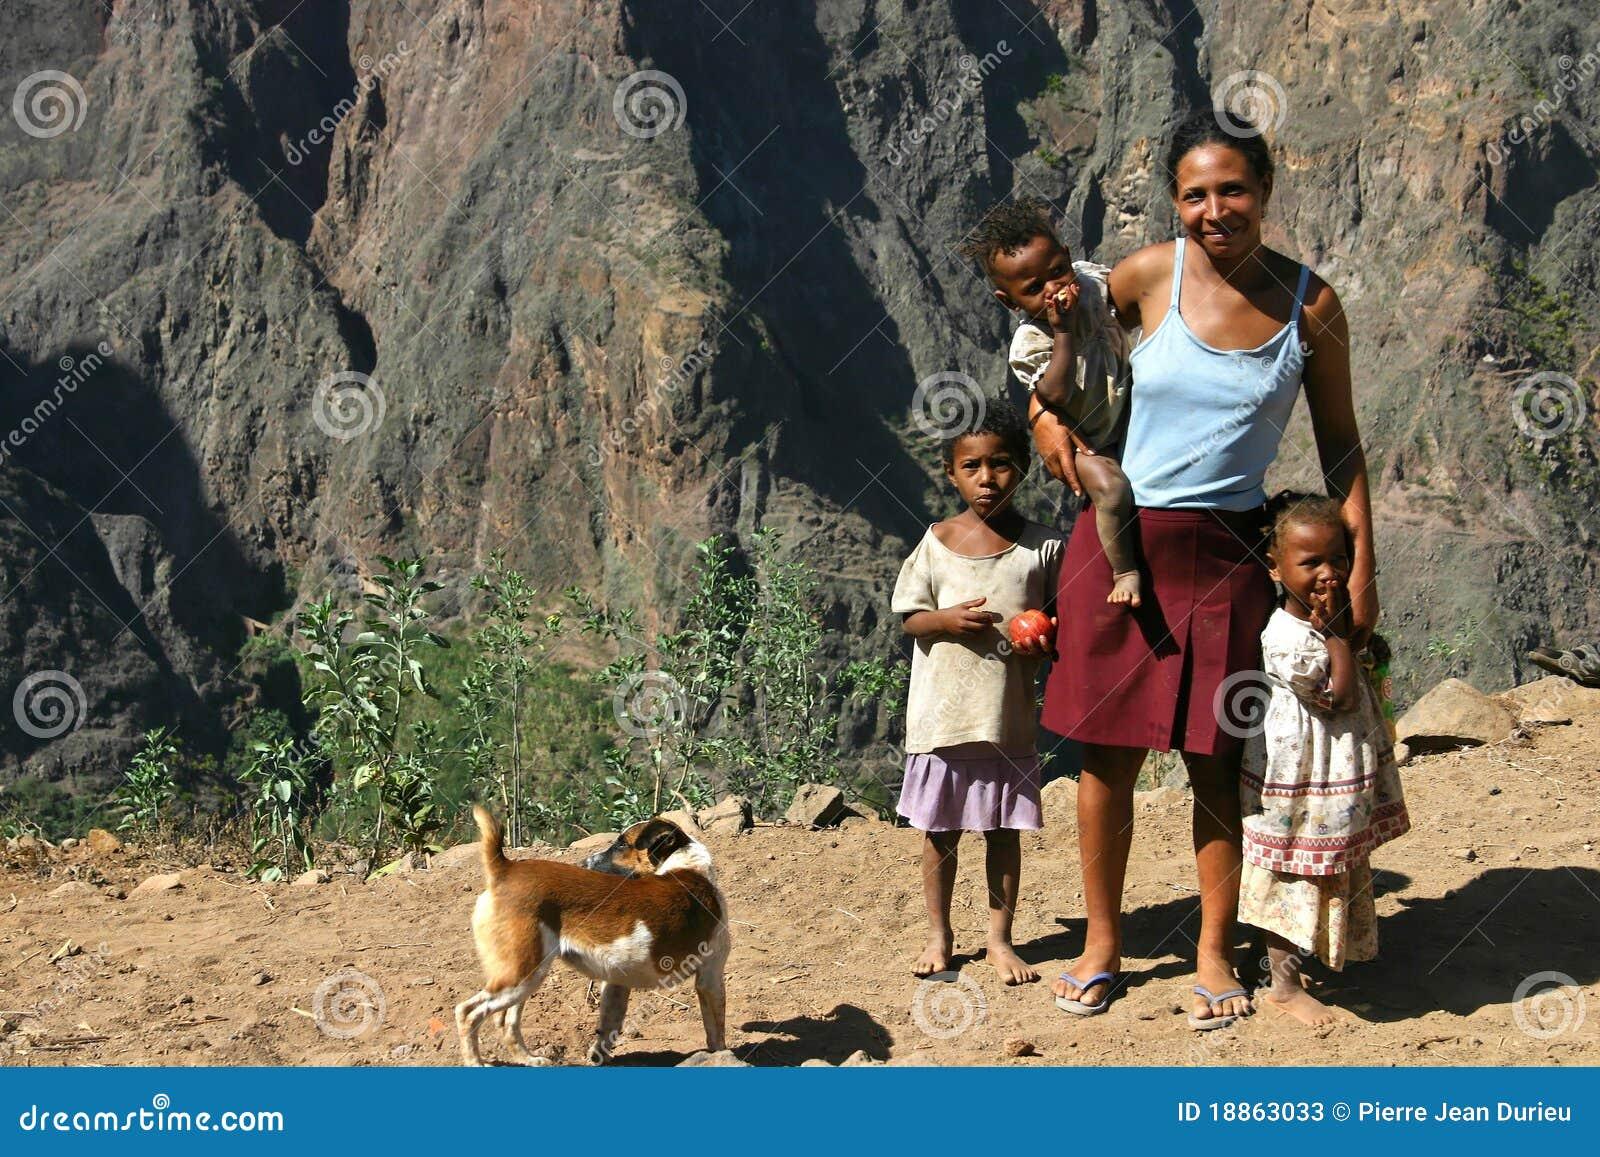 Cape Verde Family